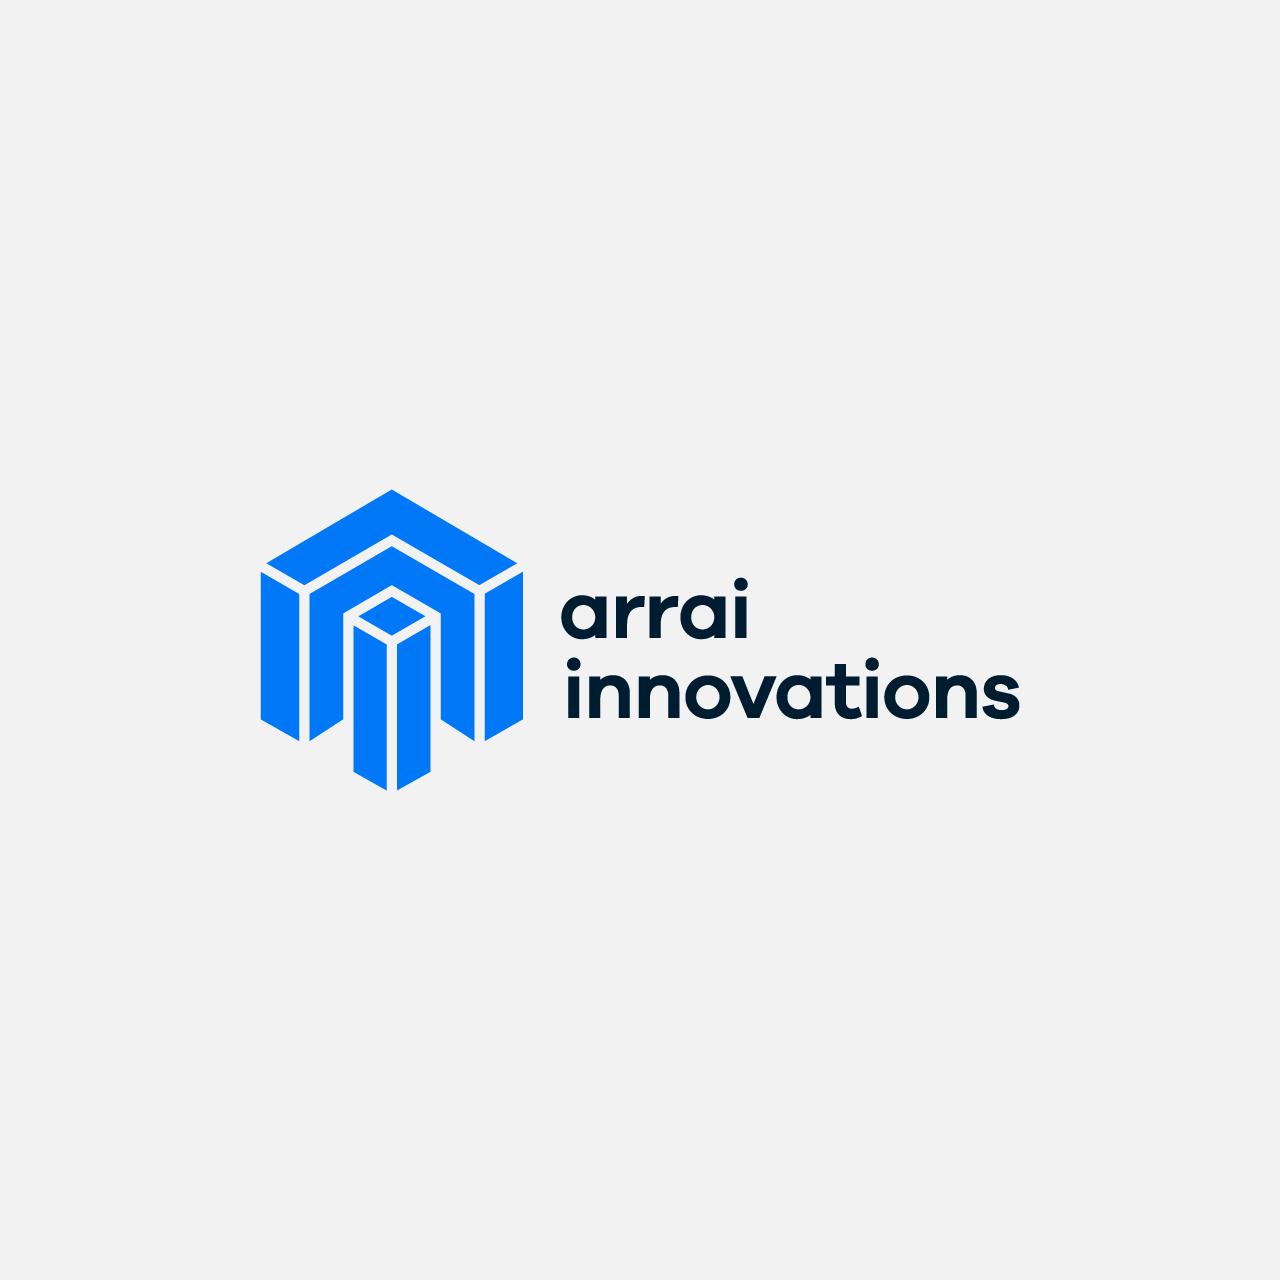 arrai_logo.png